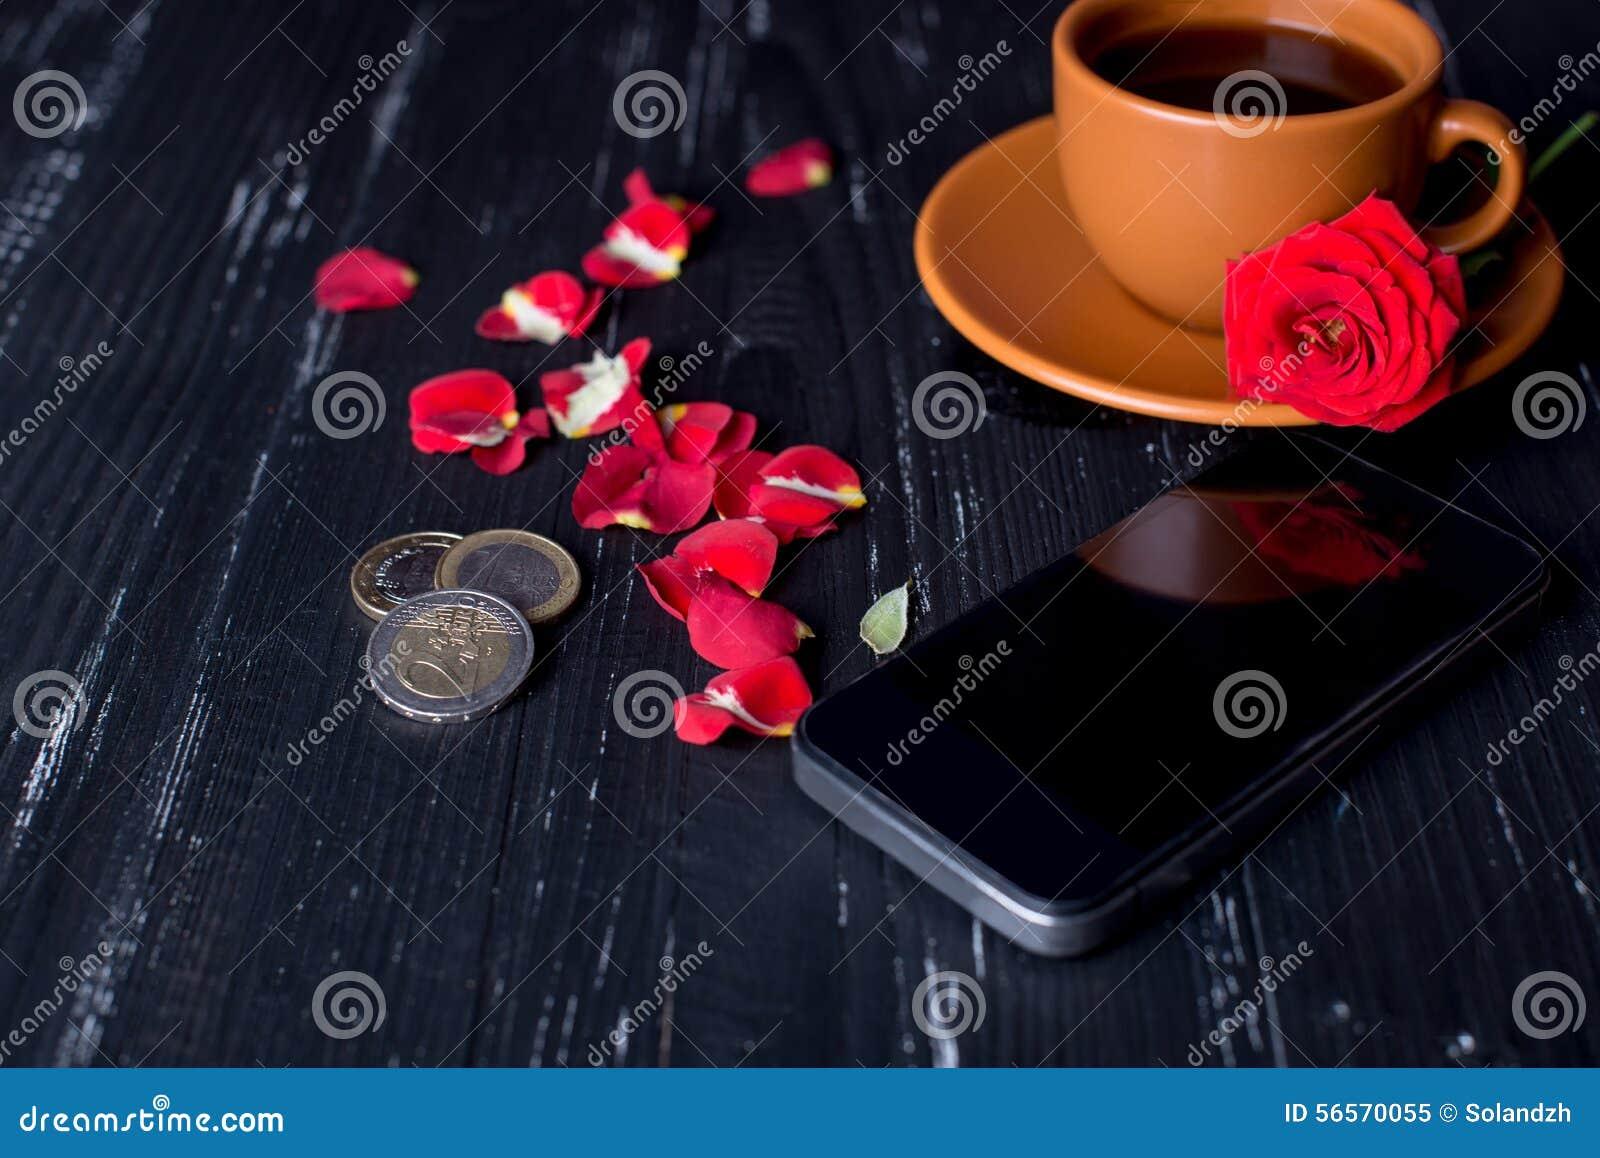 Download Πορτοκαλί φλυτζάνι καφέ με τα ροδαλά πέταλα, το κινητό τηλέφωνο και τα ευρο- νομίσματα στο μαύρο υπόβαθρο Στοκ Εικόνα - εικόνα από μαύρα, τρόφιμα: 56570055